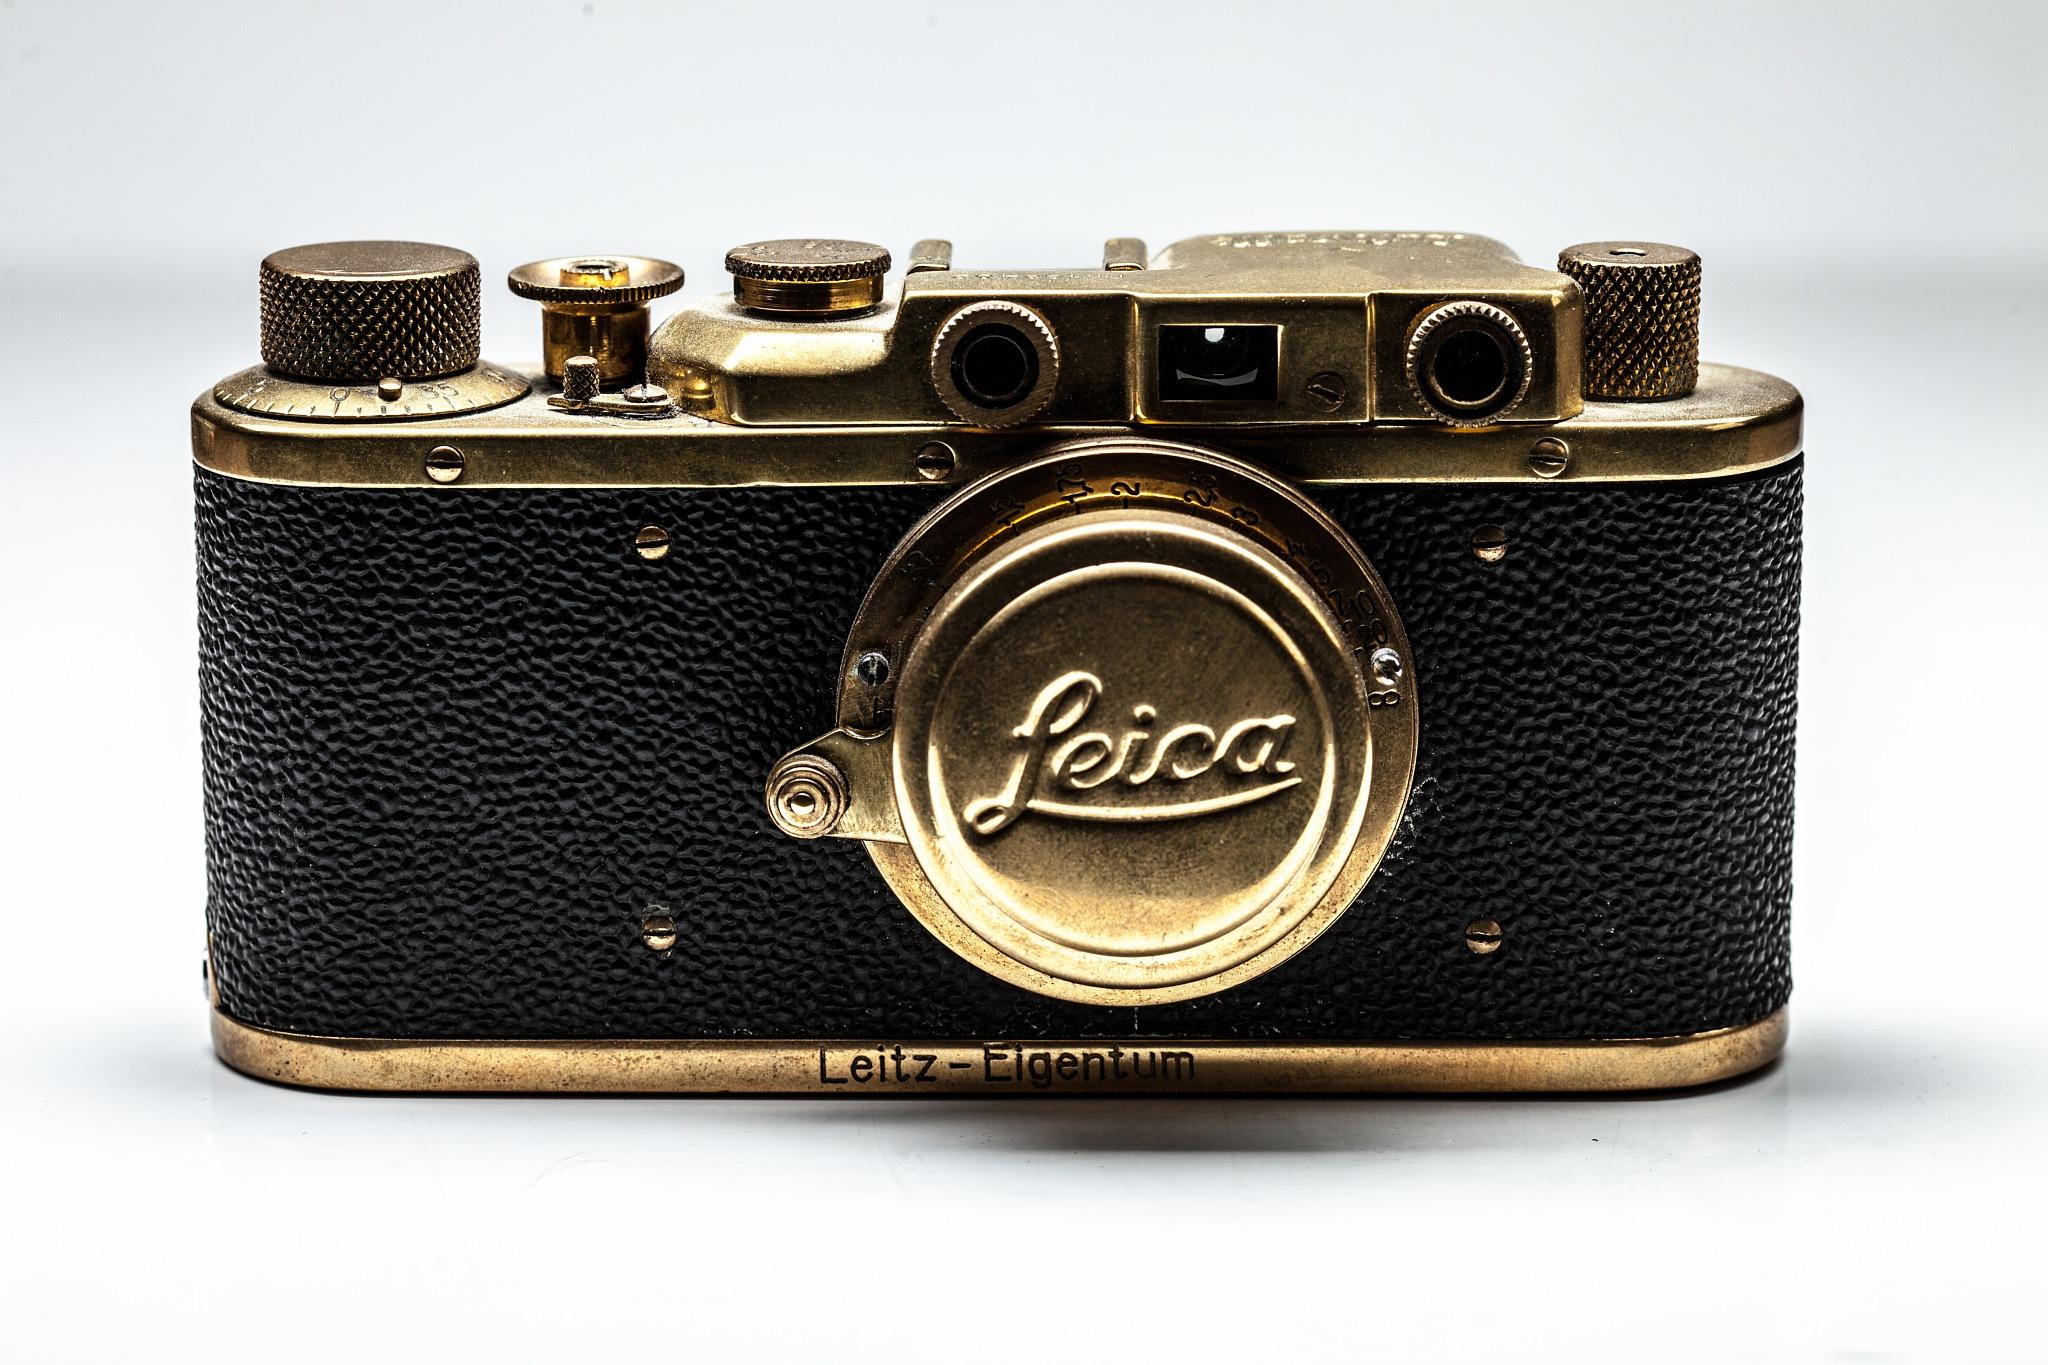 Camera by AlexVakulin